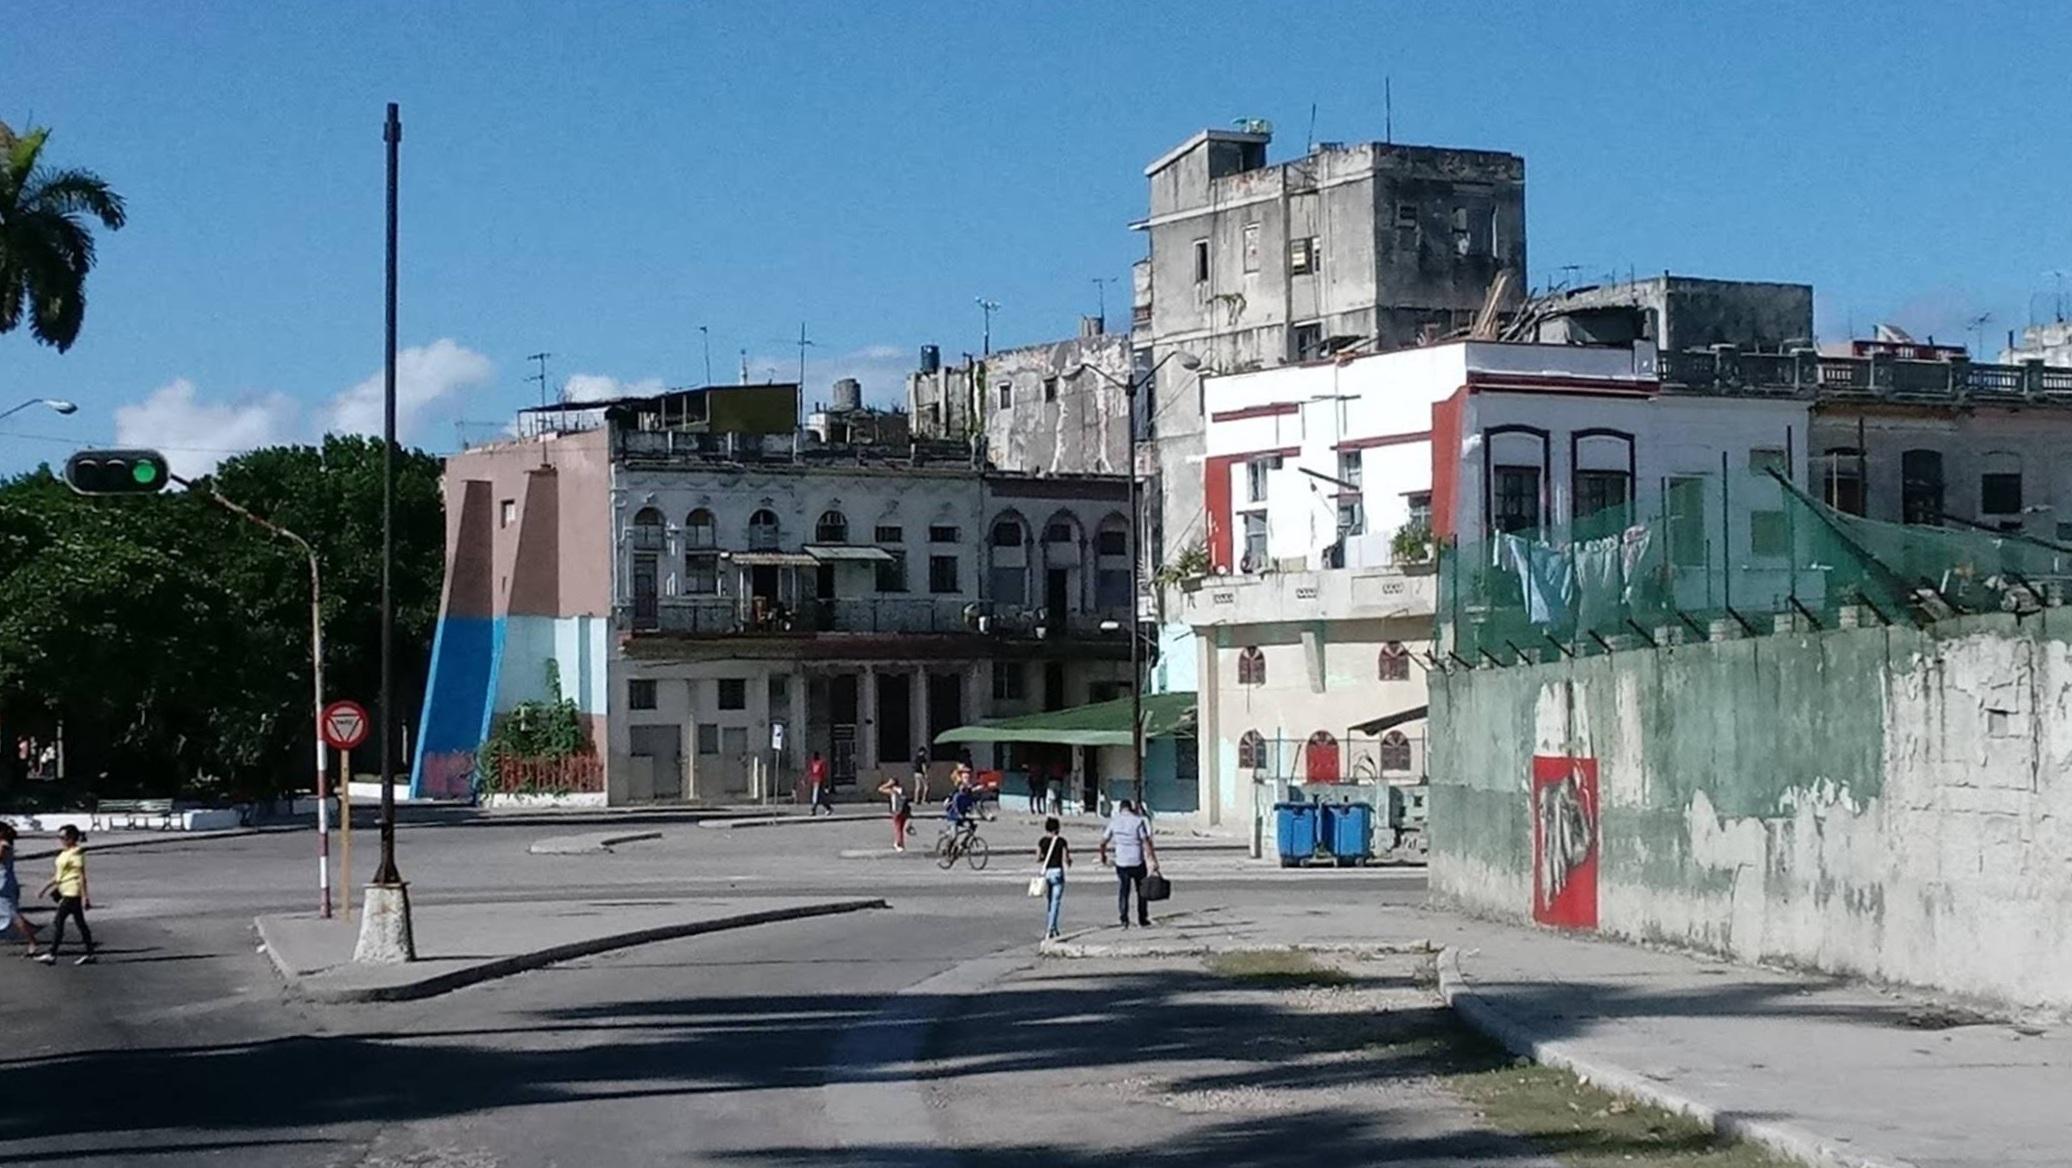 A typical neighborhood in Havana